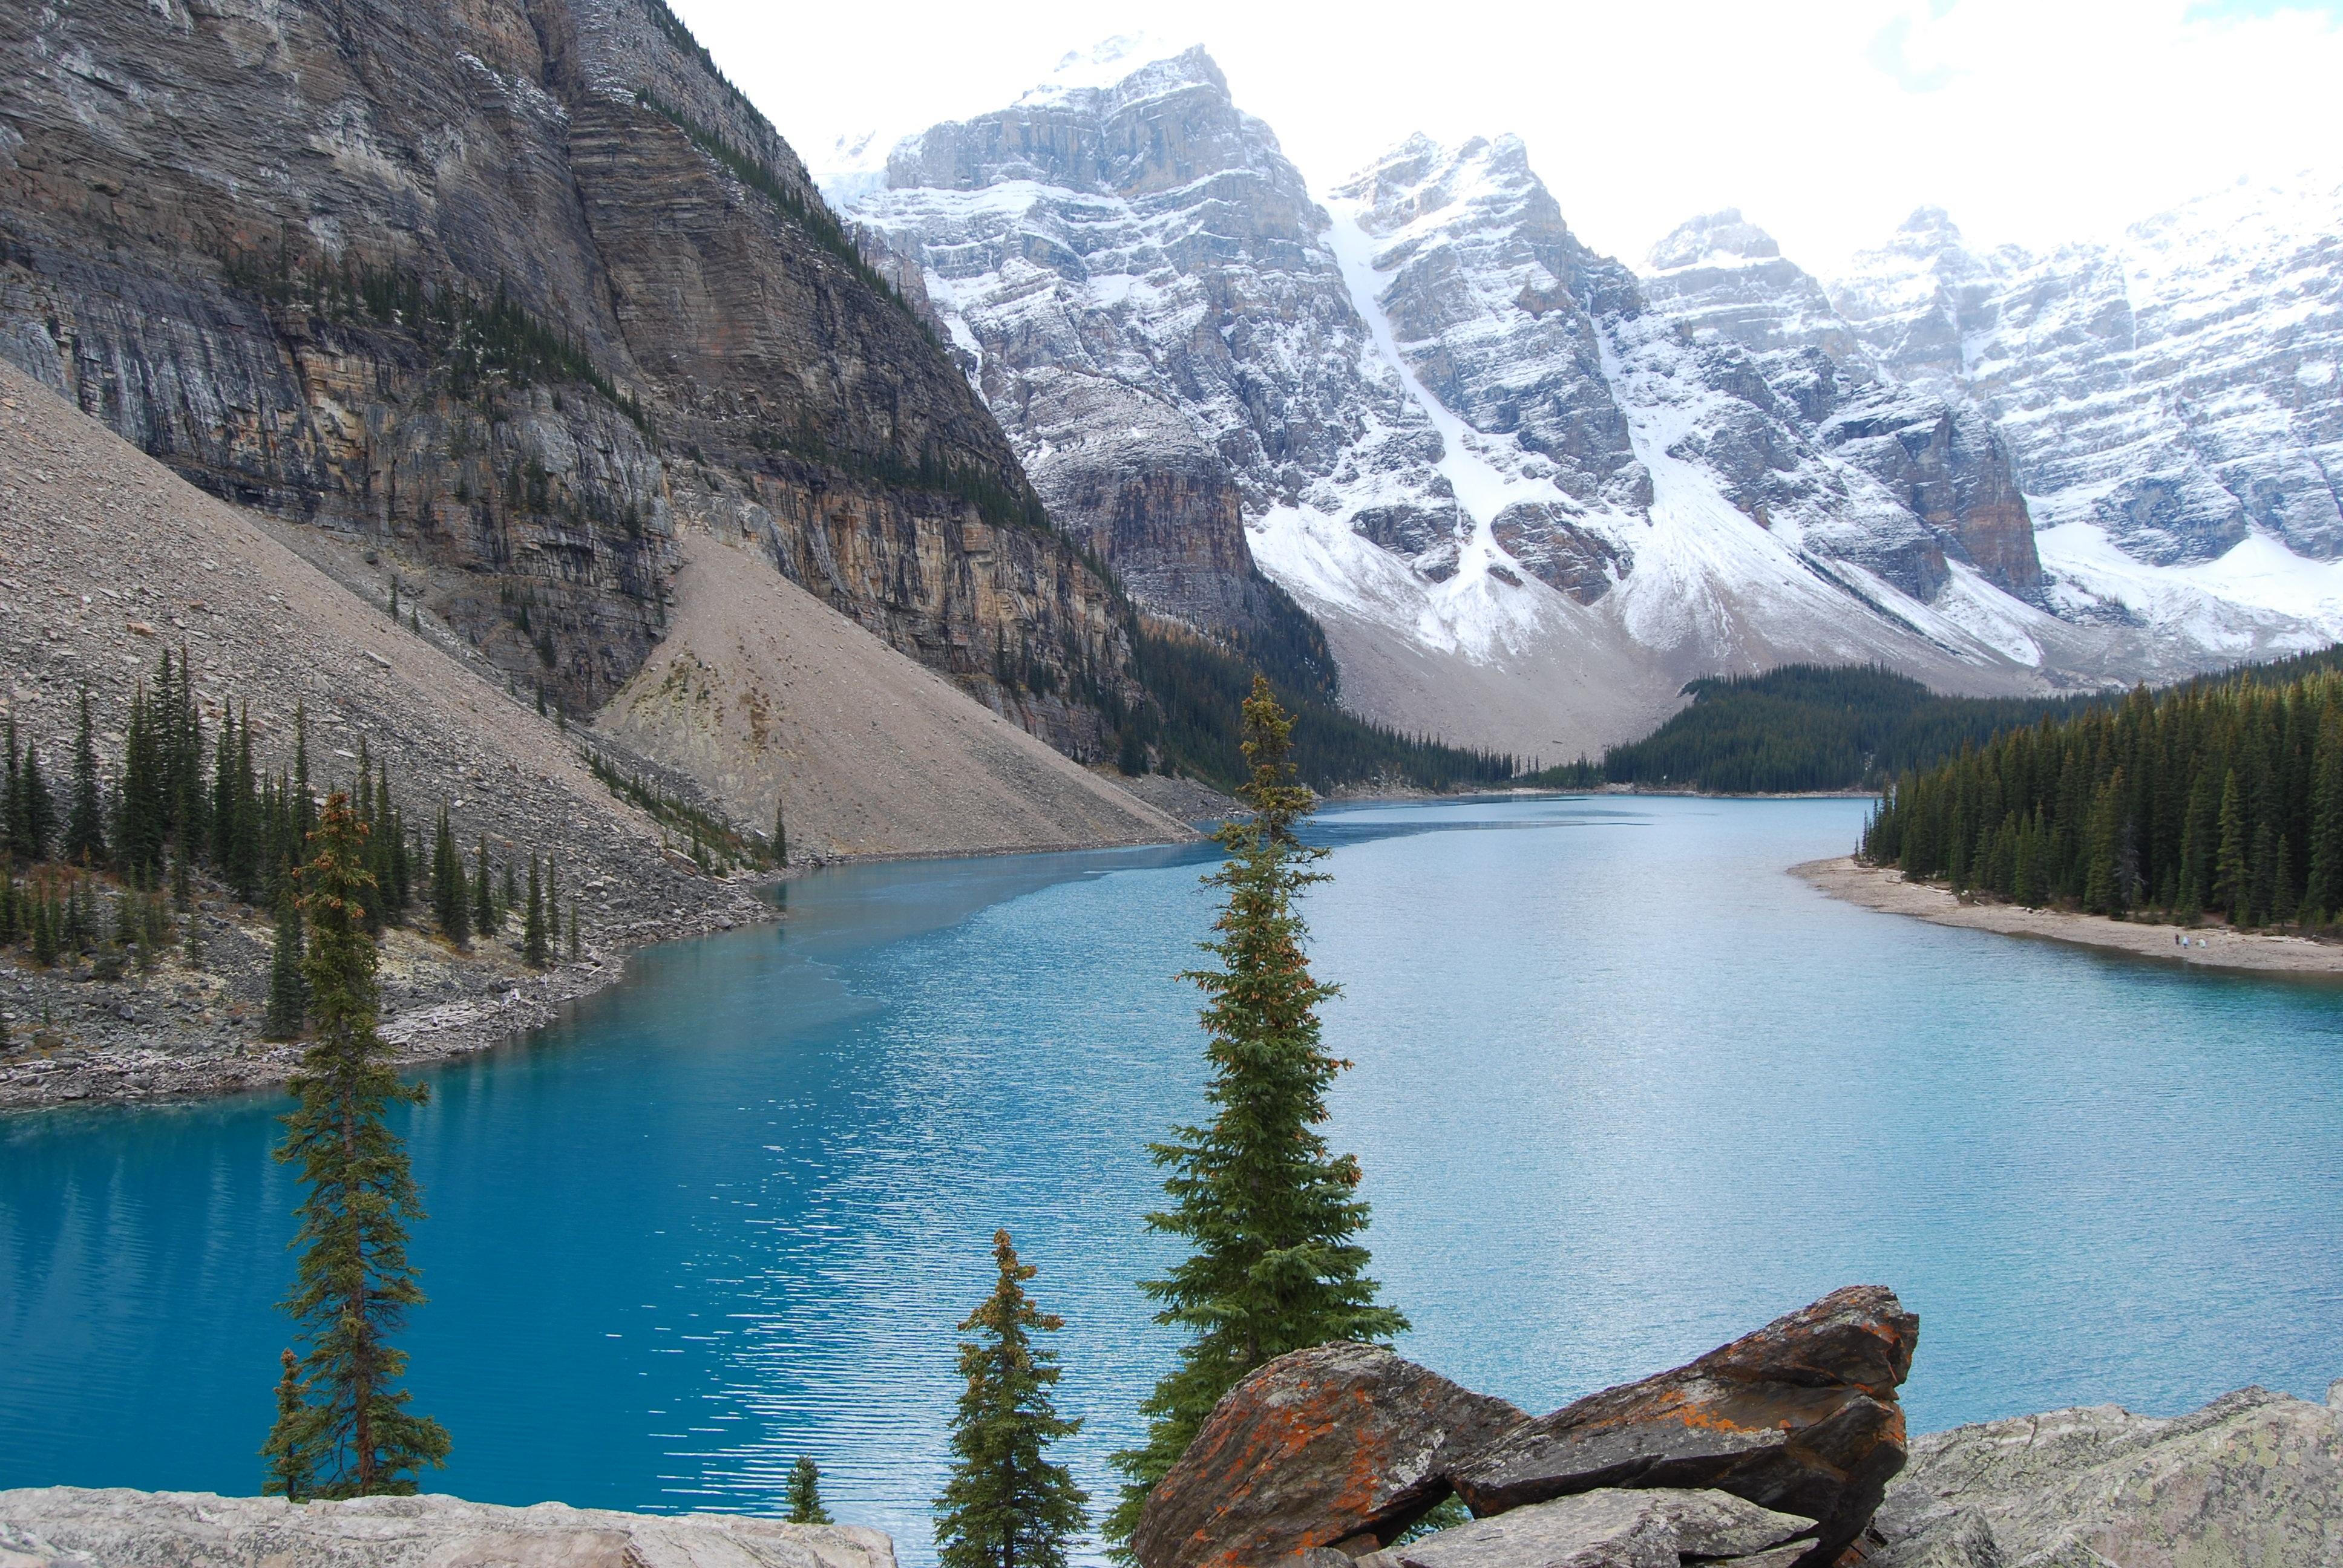 Fotos gratis monta a nieve lago valle cordillera for Arboles de hoja perenne para clima frio